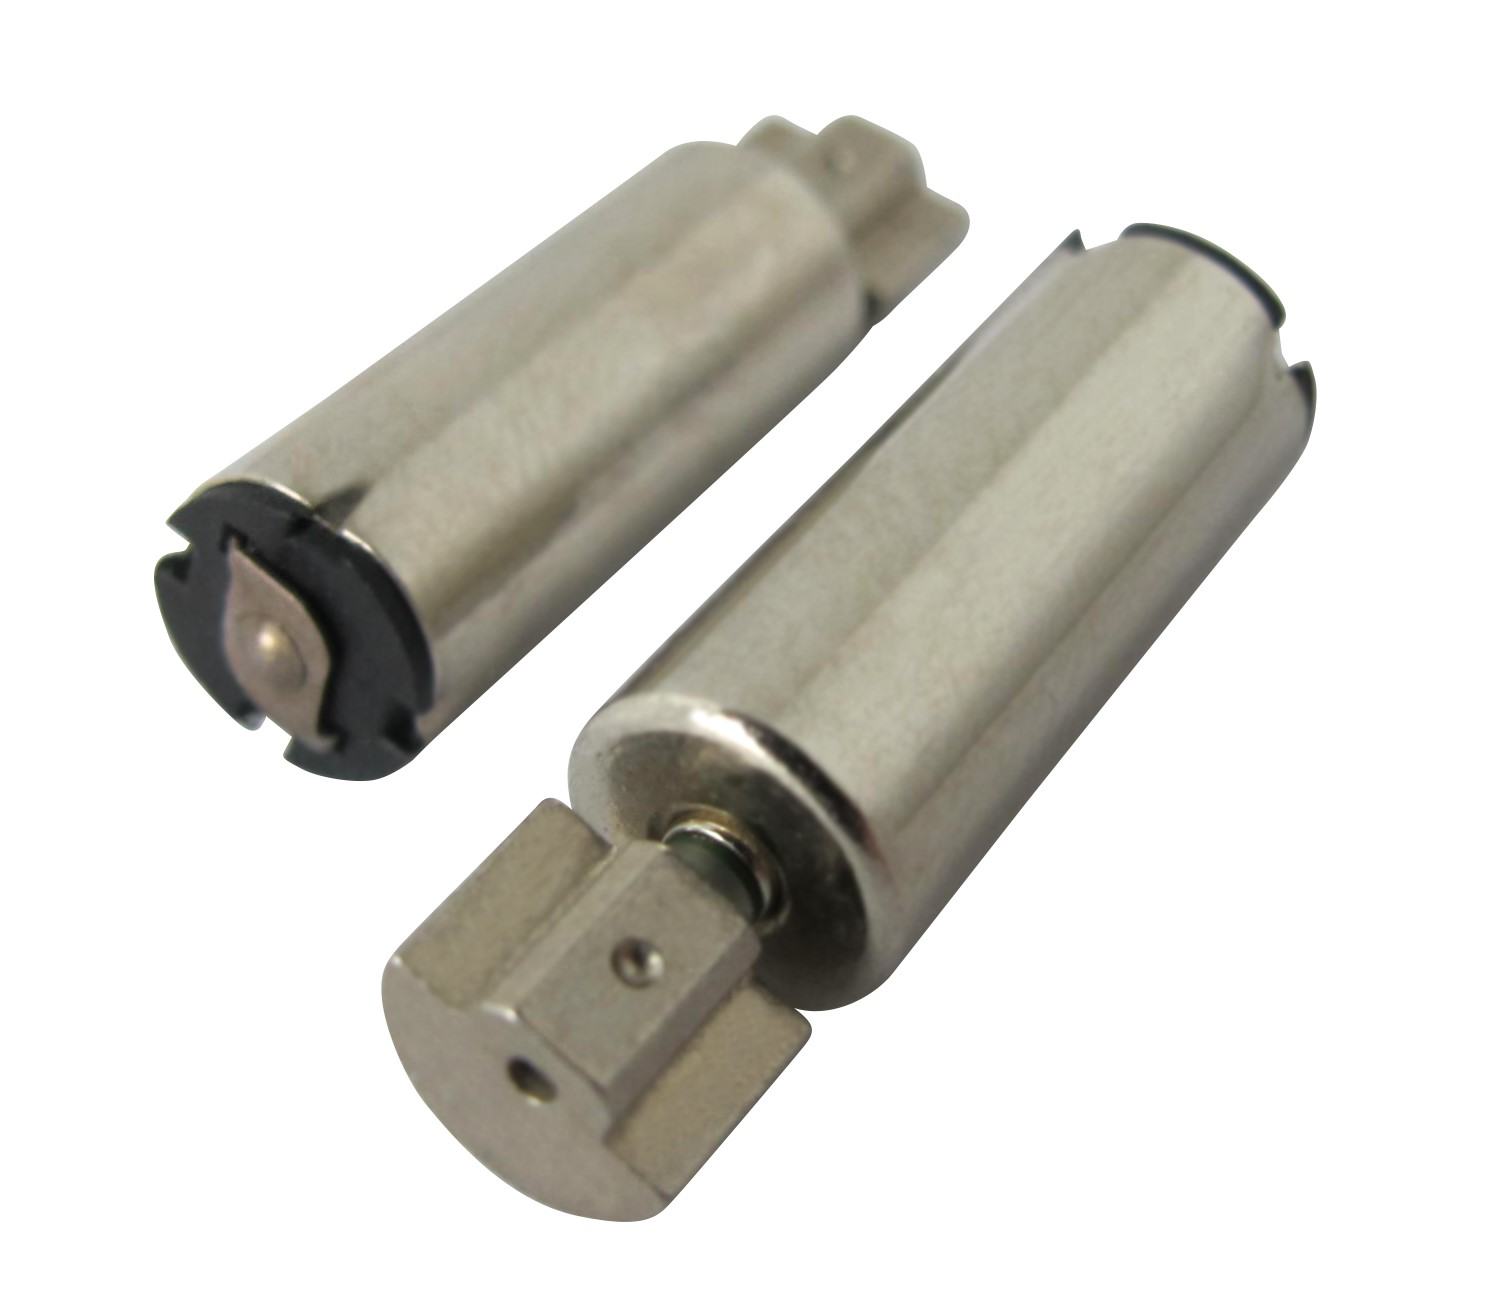 Z6CC3A0540001 Cylindrical Vibrator Motor